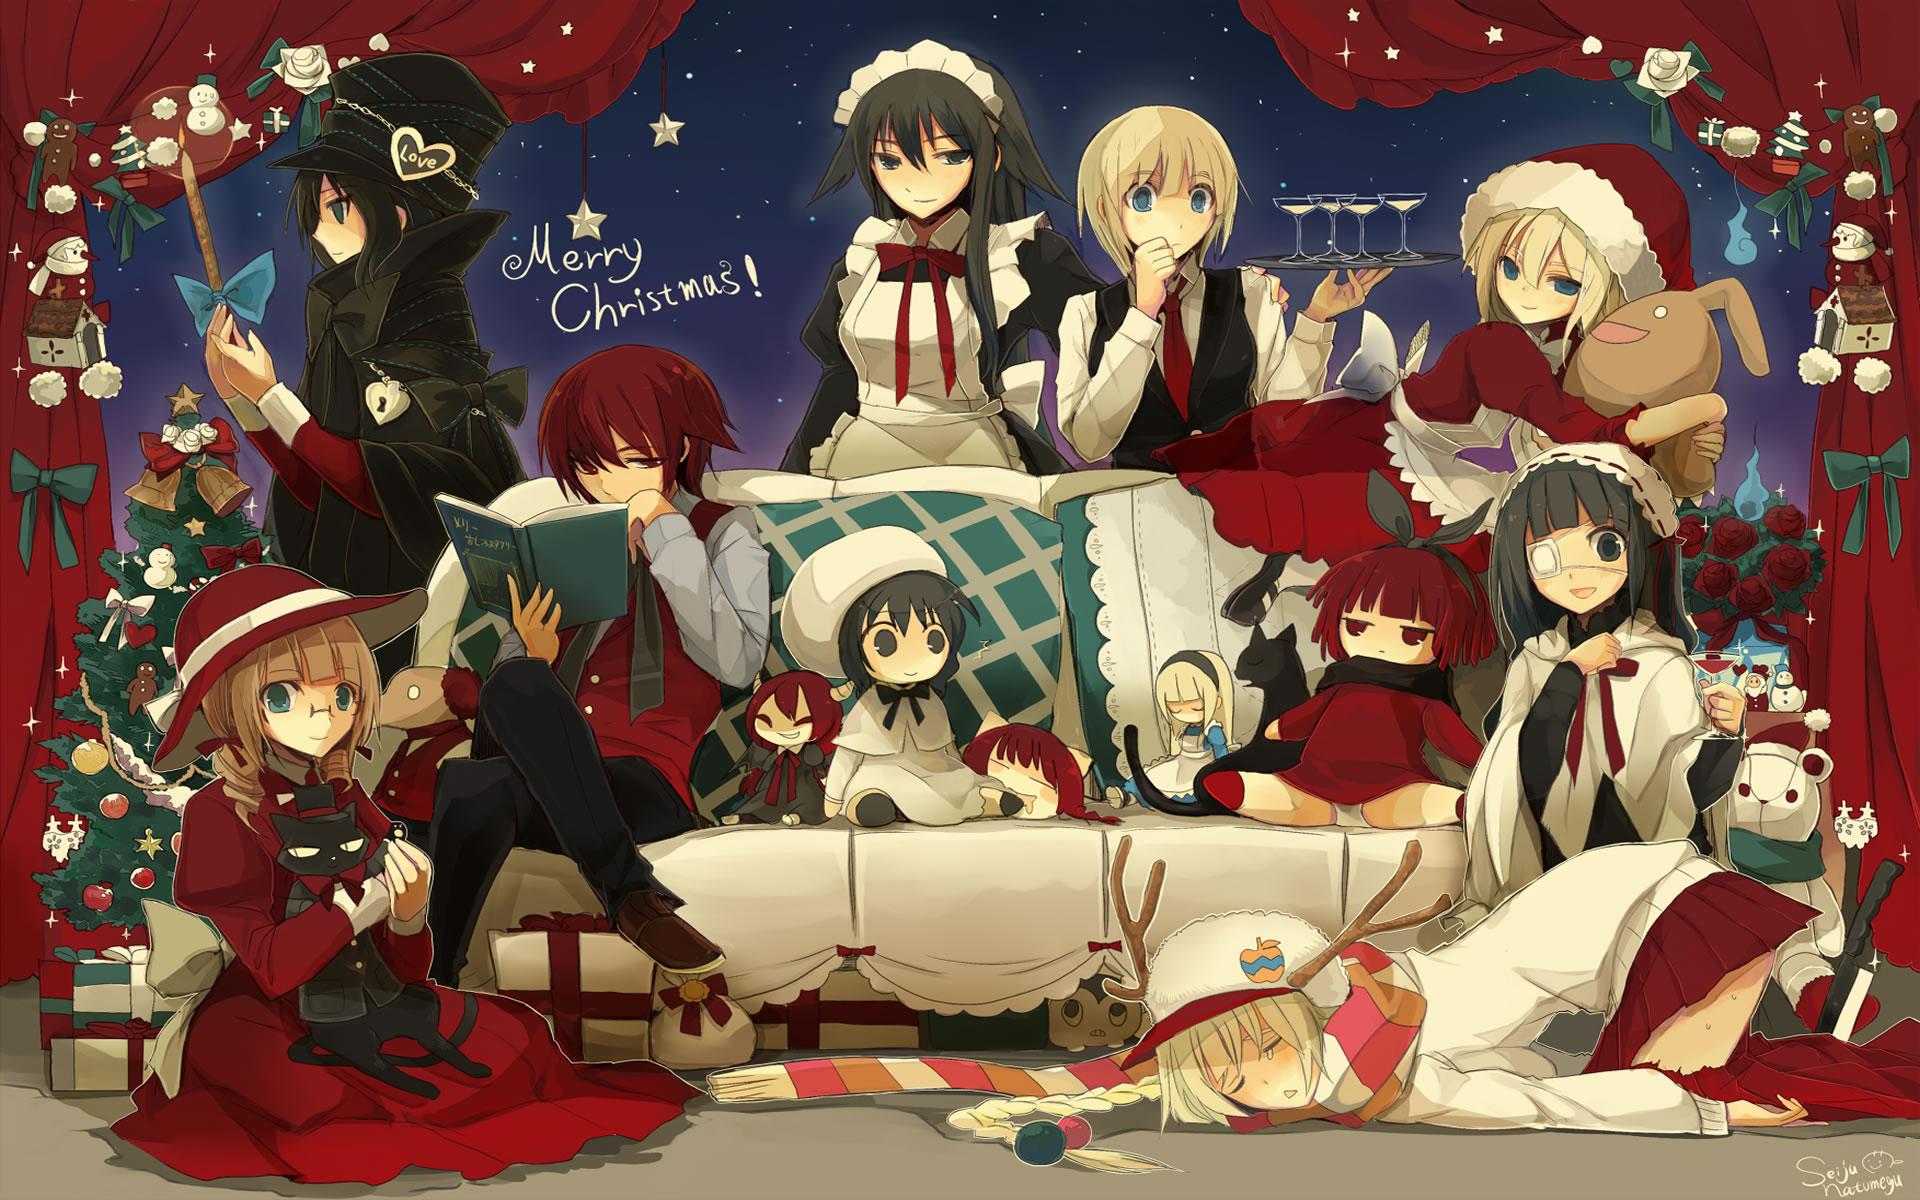 Merry Christmas Anime Wallpaper